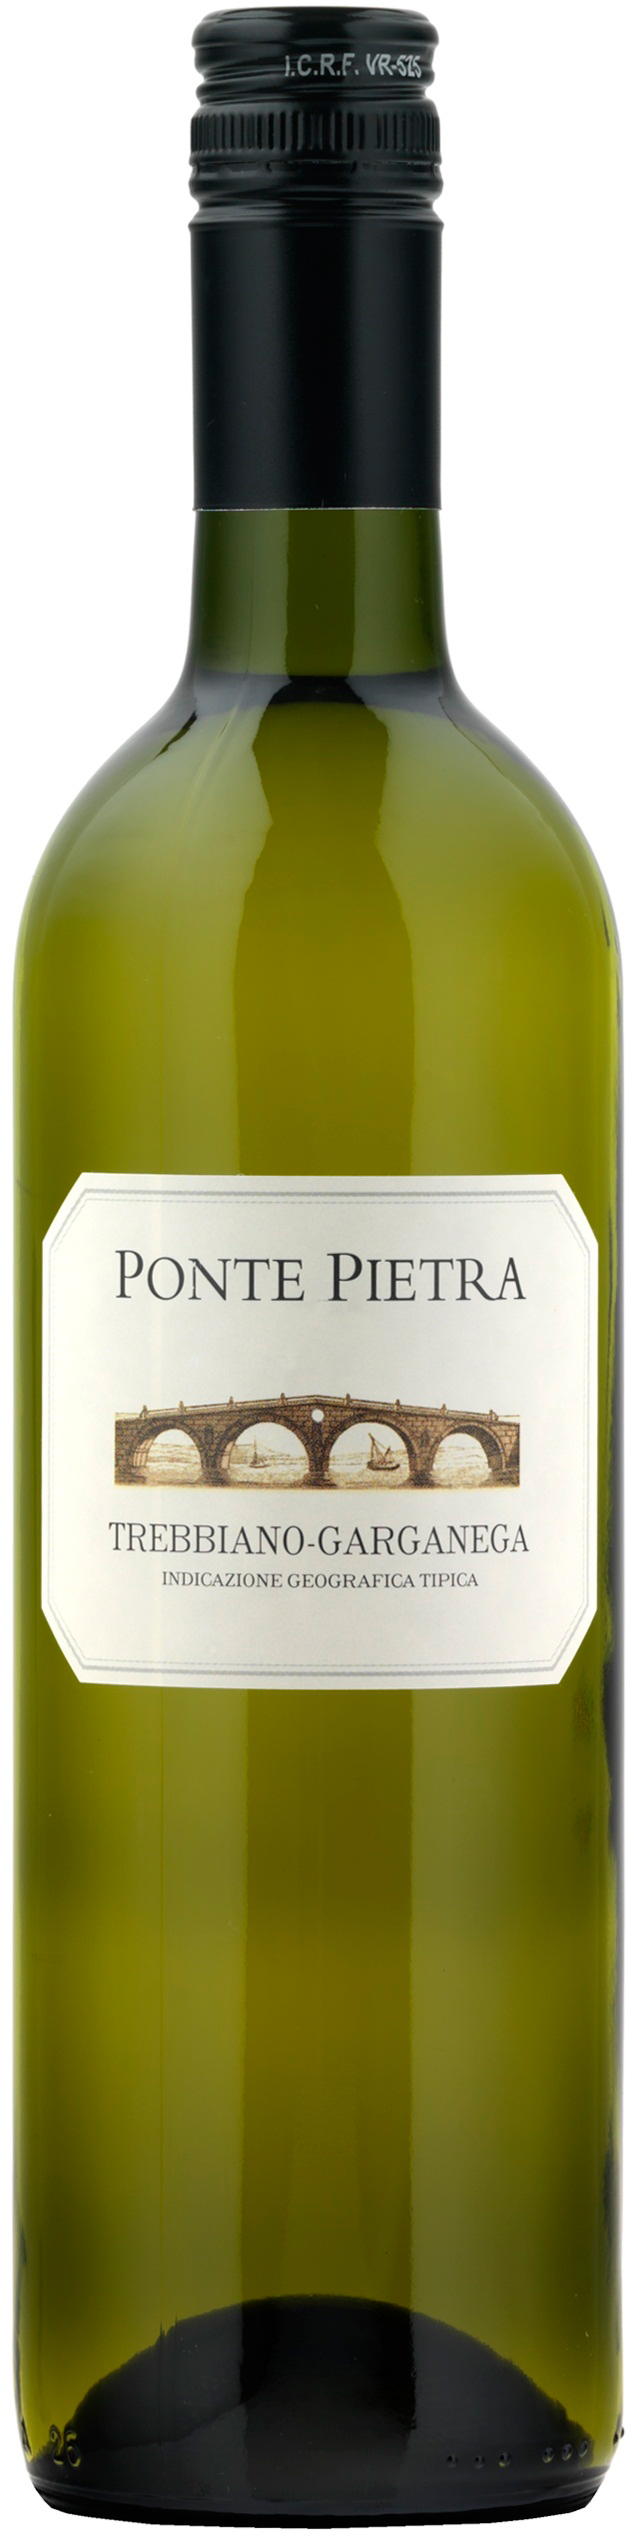 Ponte Pietra, Trebbiano/Garganega 2017